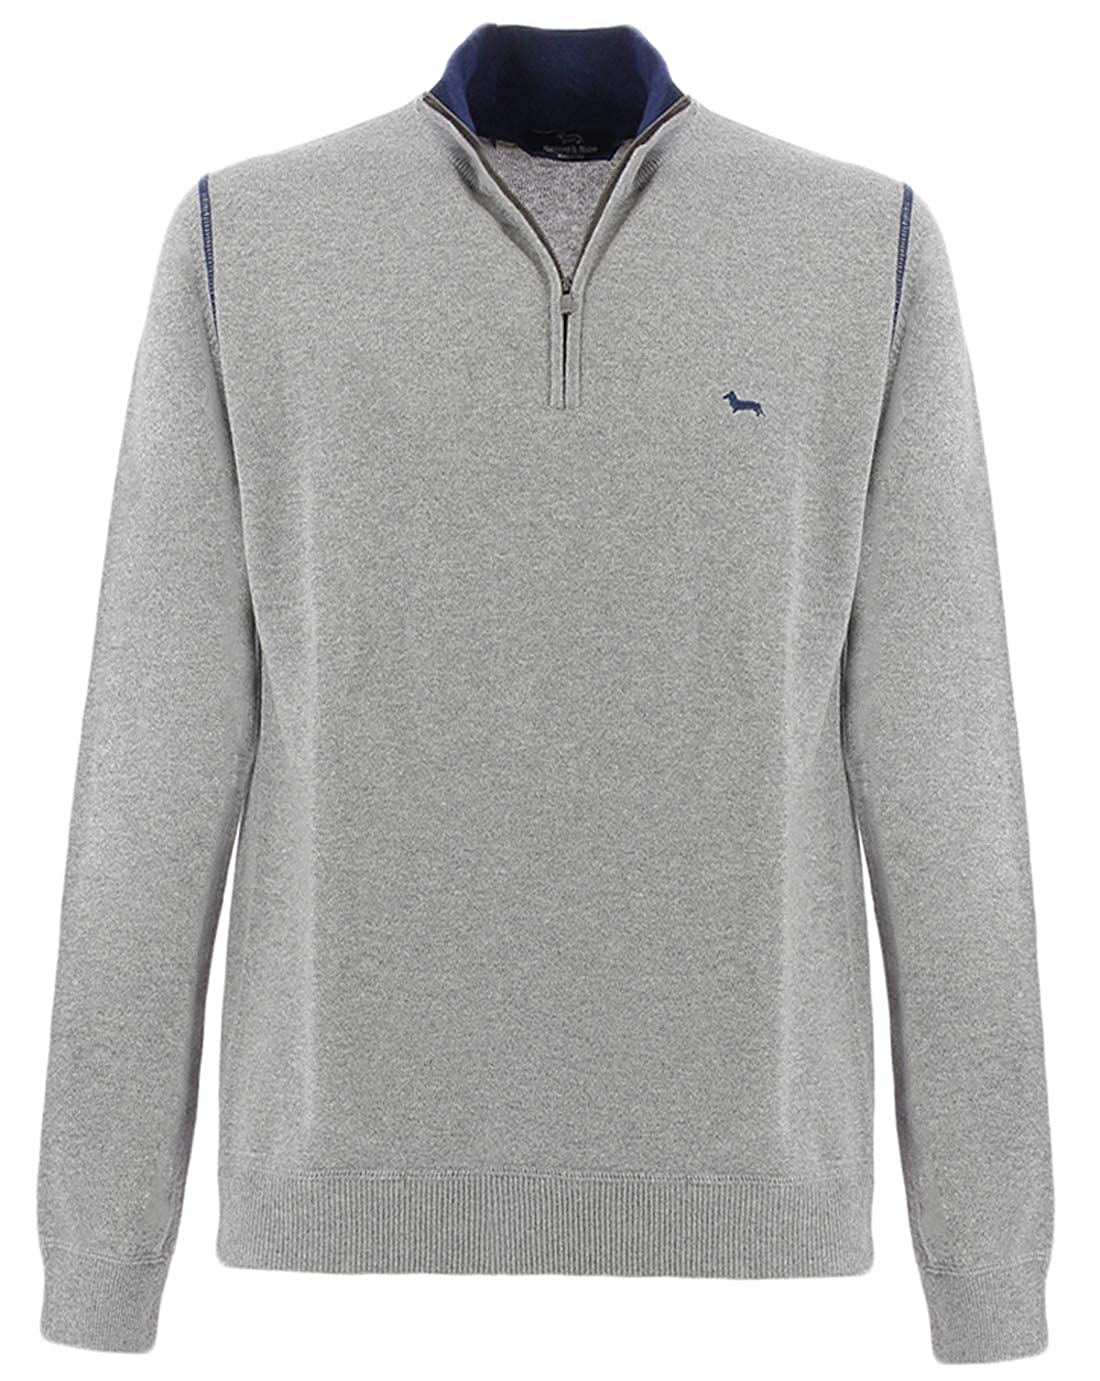 Harmont /& Blaine Gray Half-Zip Sweater